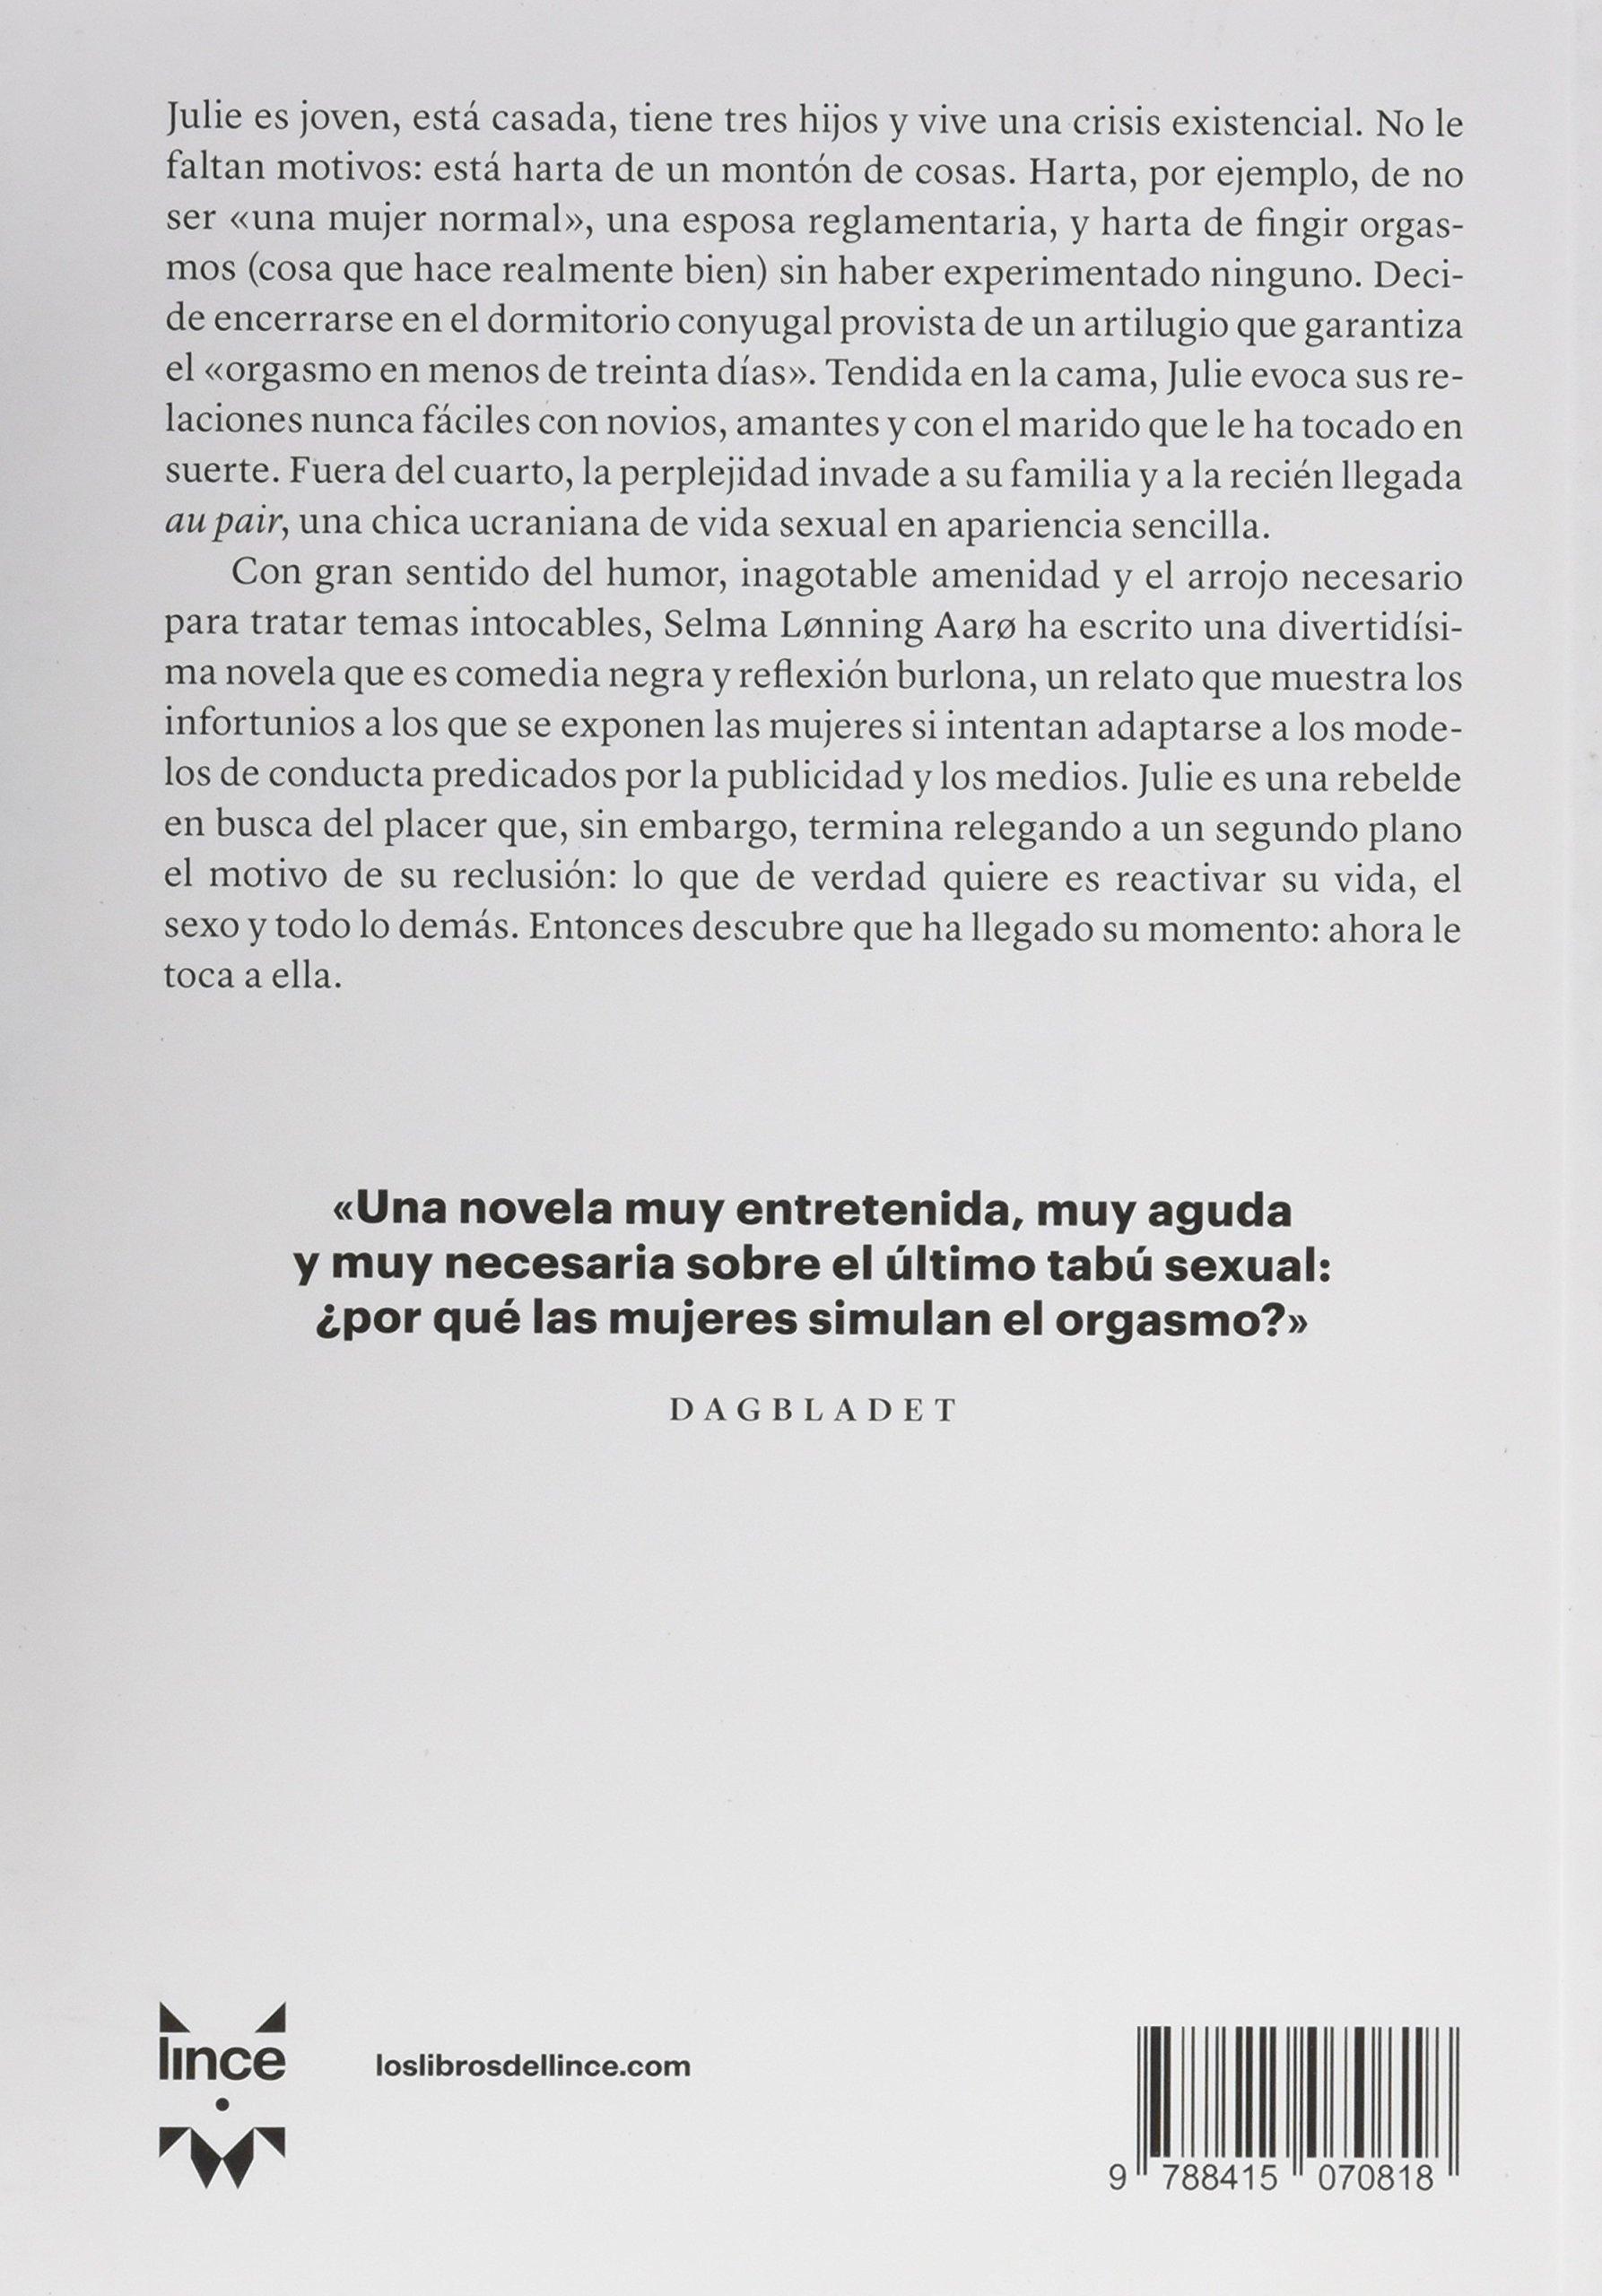 Ahora me toca a mi (Spanish Edition): Selma Lonning Aaro: 9788415070818: Amazon.com: Books